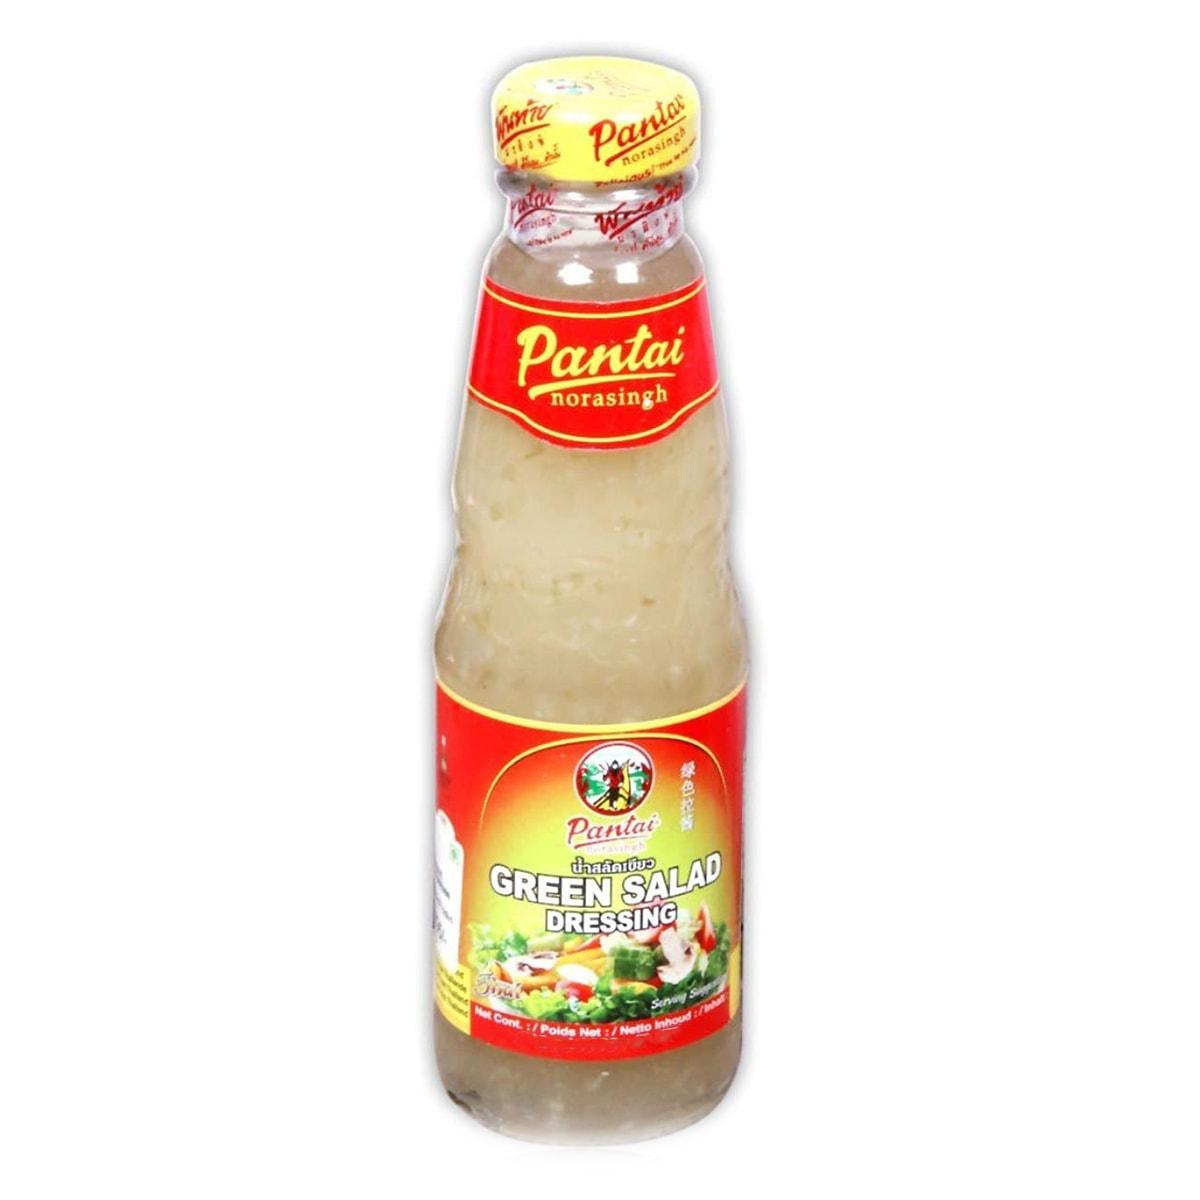 Buy Pantainorasingh Green Salad Dressing - 200 ml